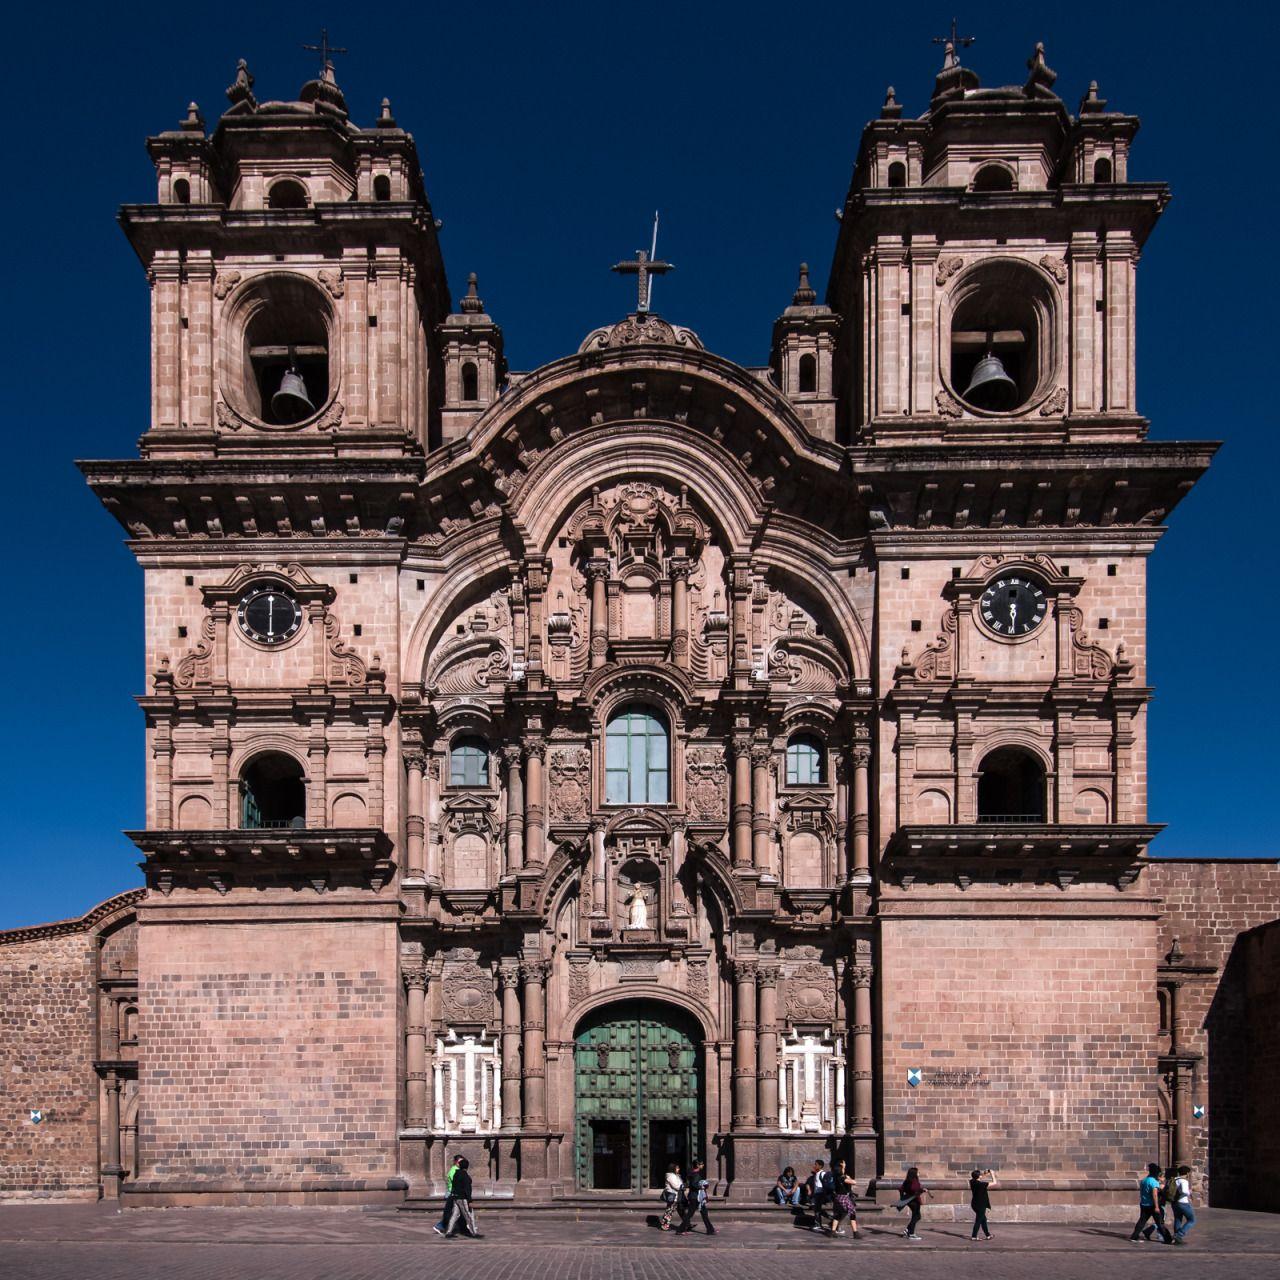 ninbra: Church of the Society of Jesus in the Plaza de Armas, Cusco, Peru.